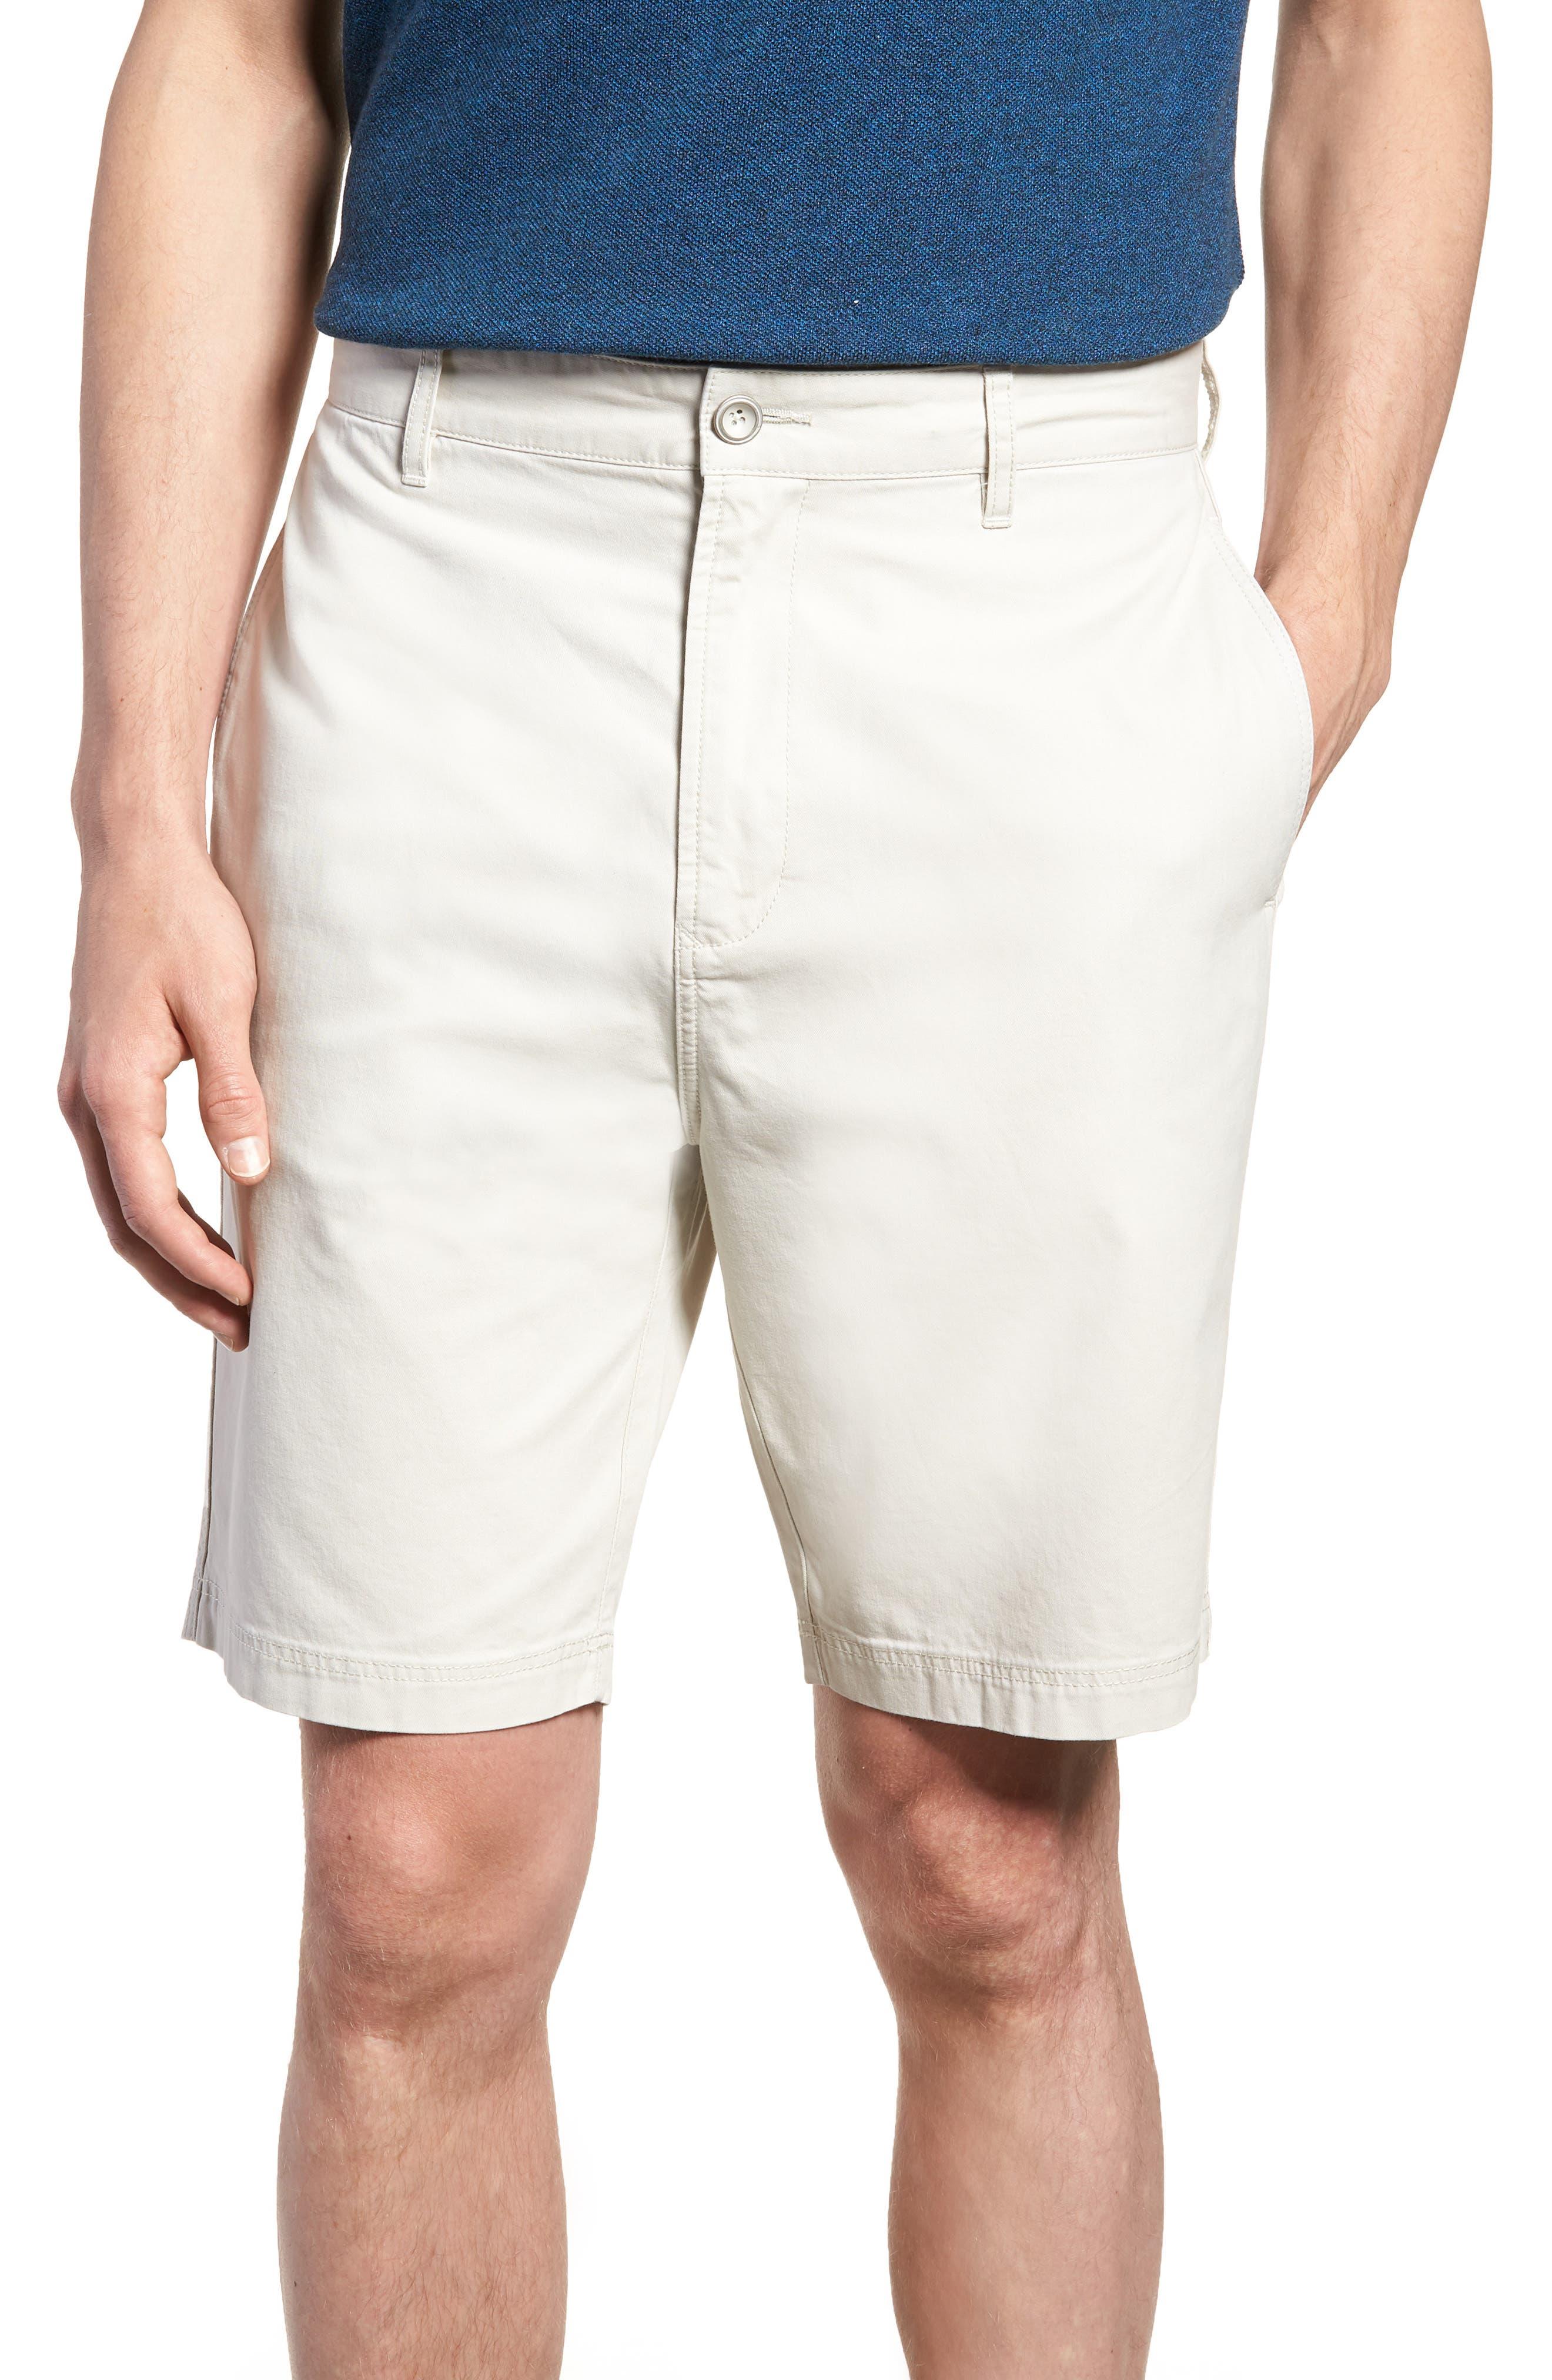 RODD & GUNN Glenburn Shorts, Main, color, 261